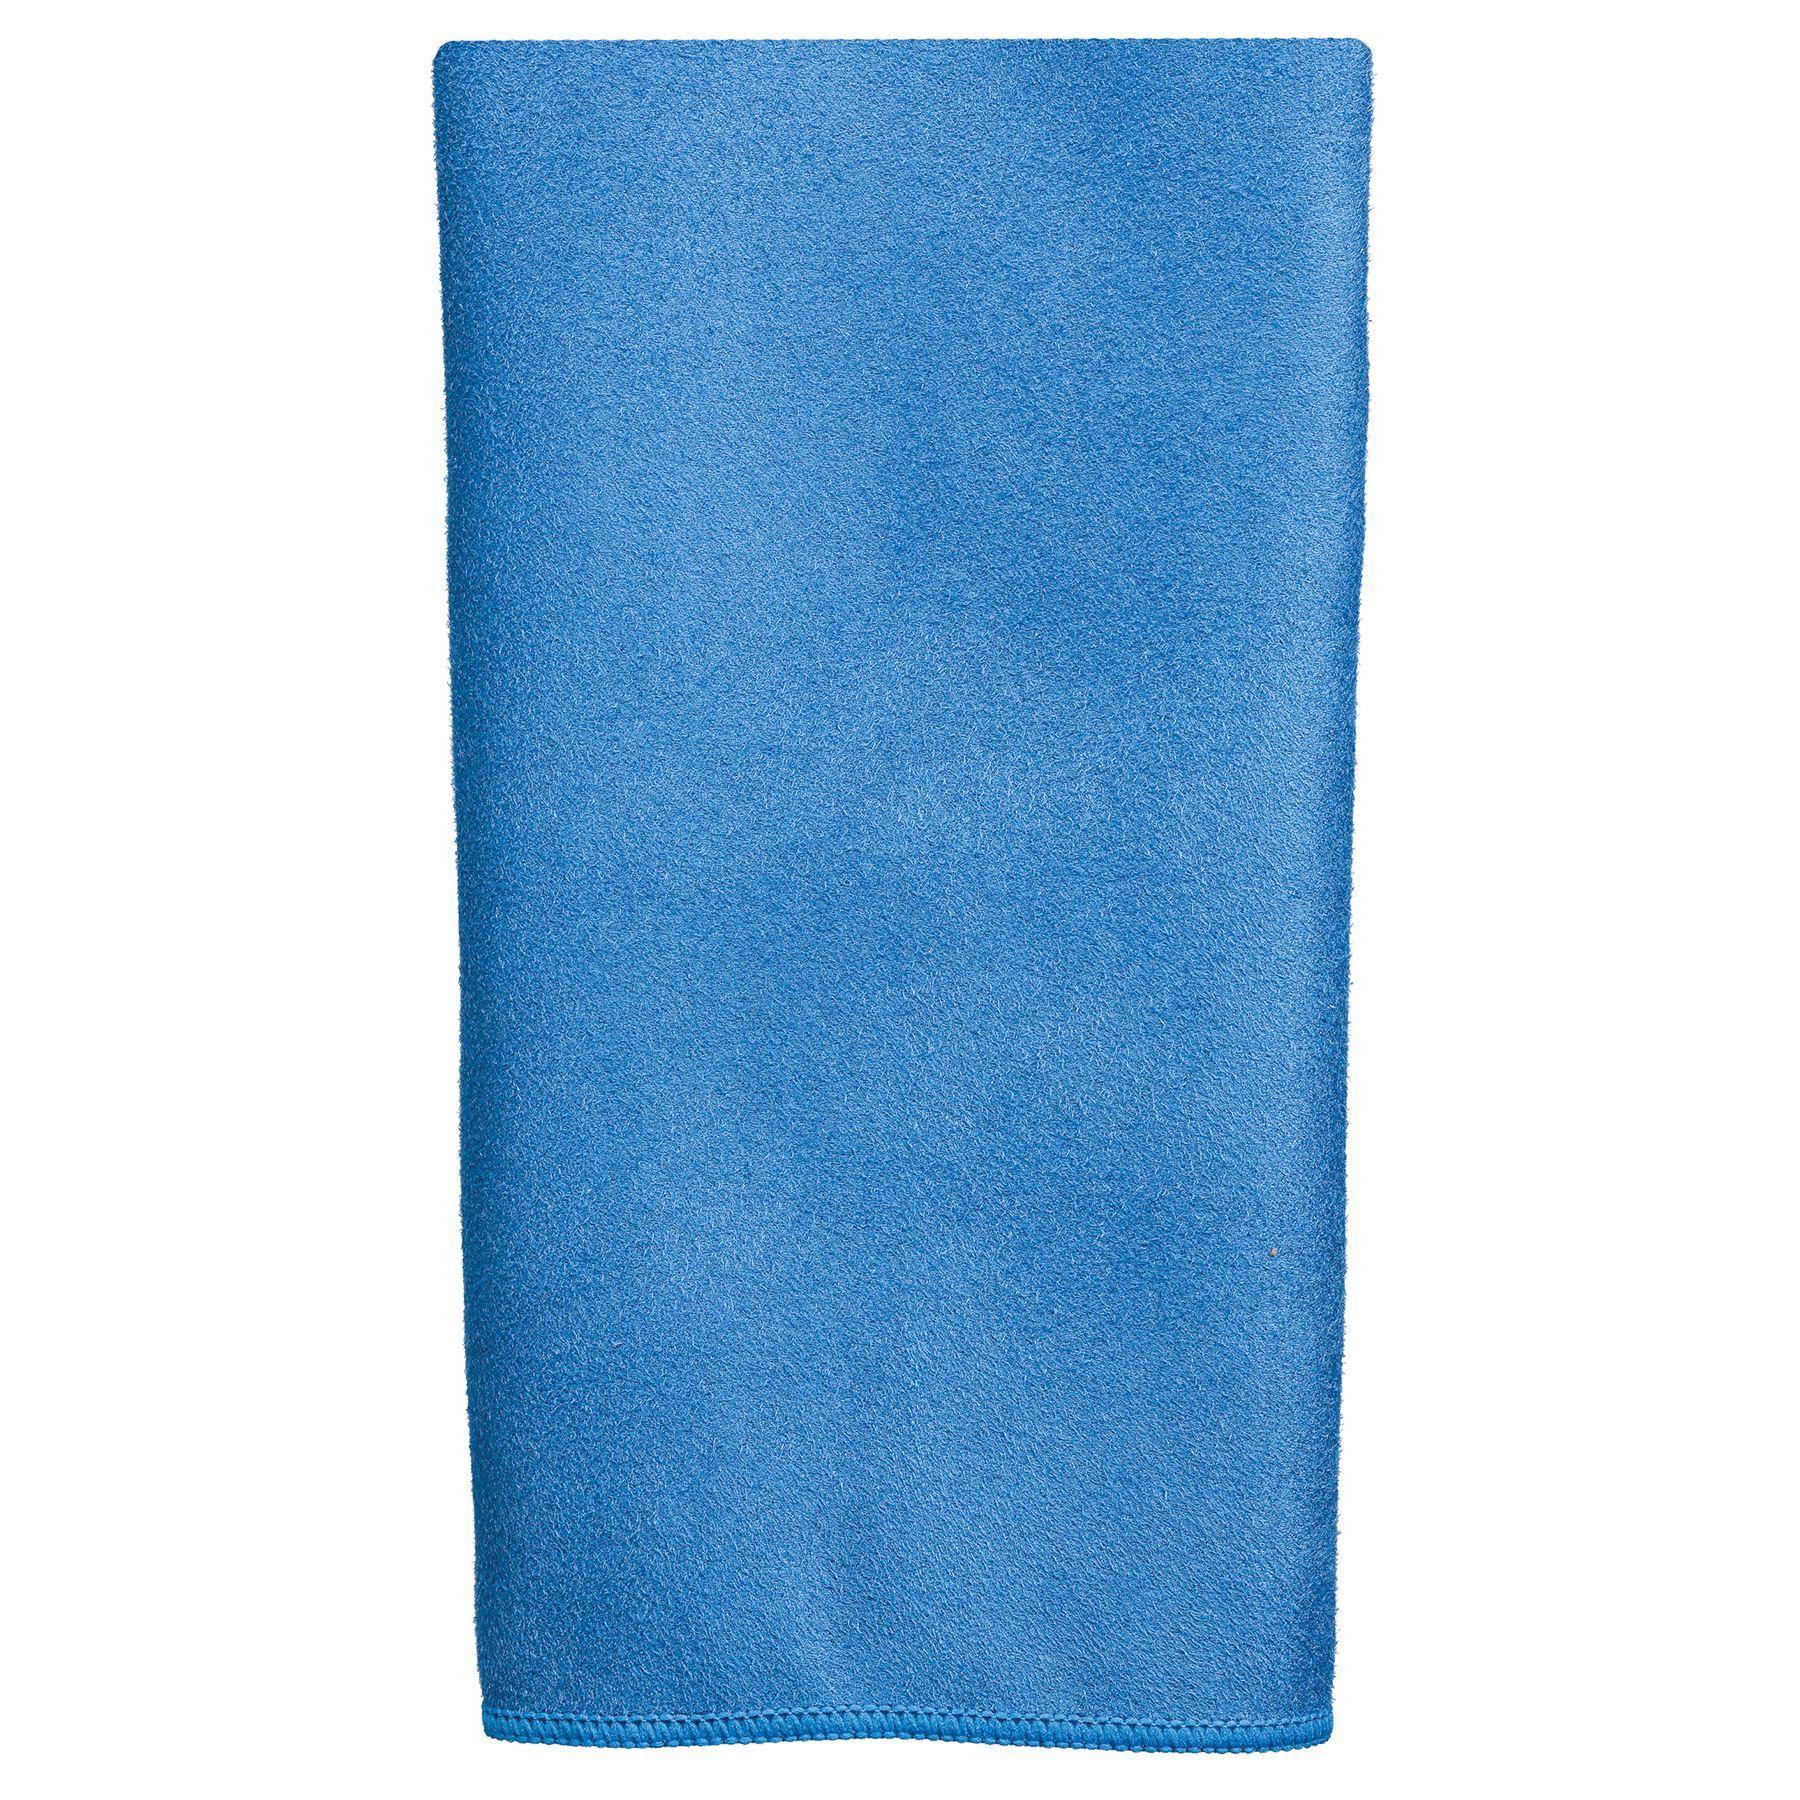 Libman Libman Microfiber Soft Touch Dust Cloth (Libman Mf